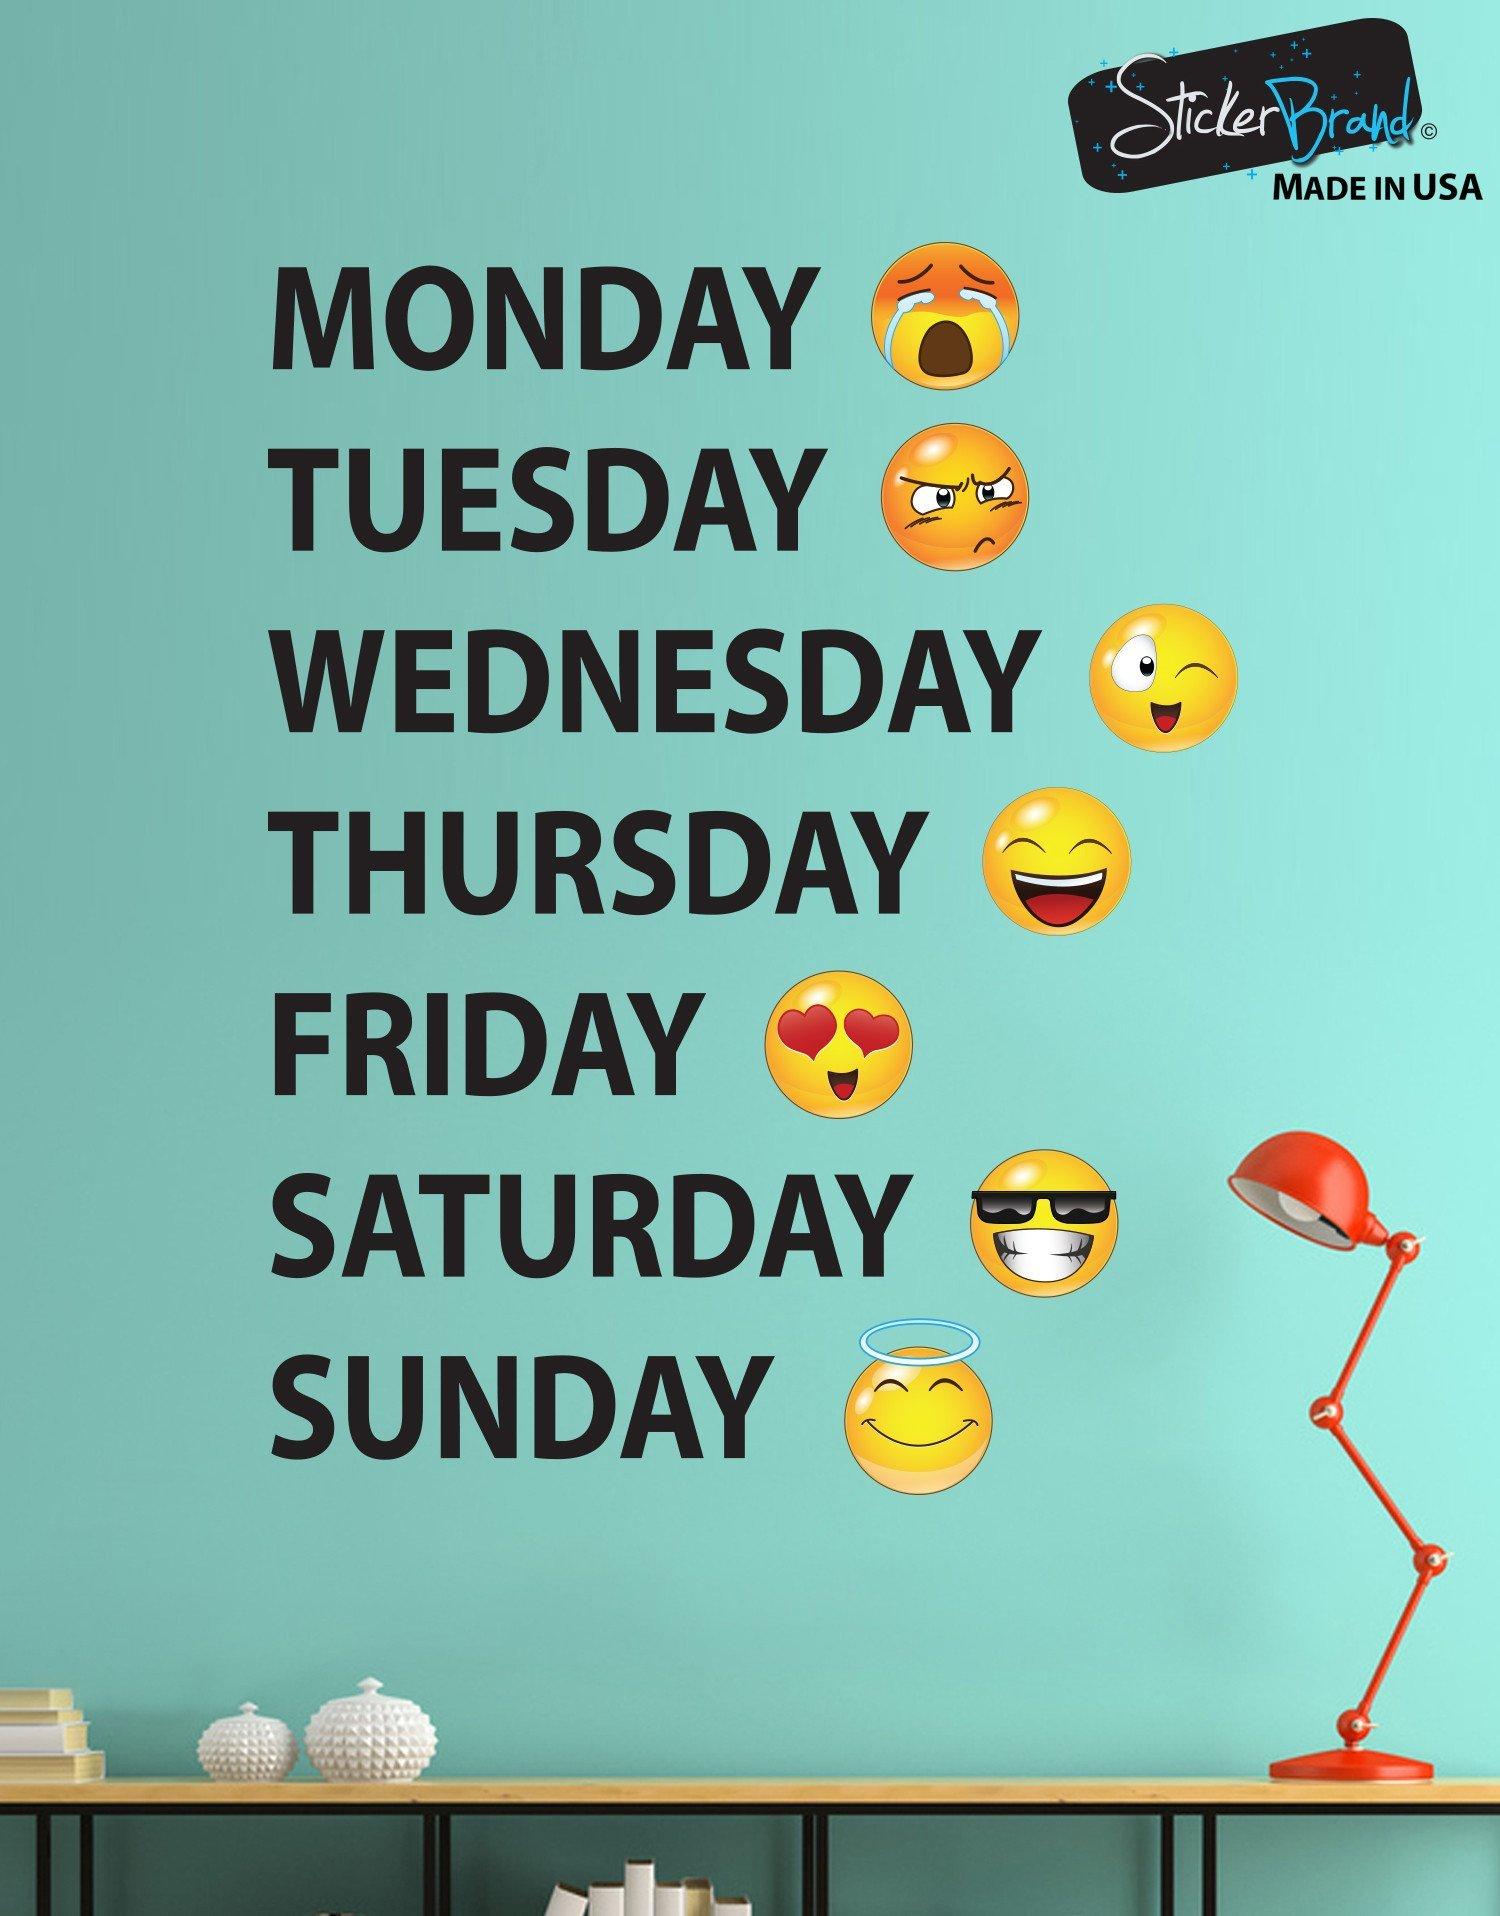 Days of the Week Emojis Vinyl Wall Decal Sticker 6071 StickerBrand 1500x1916